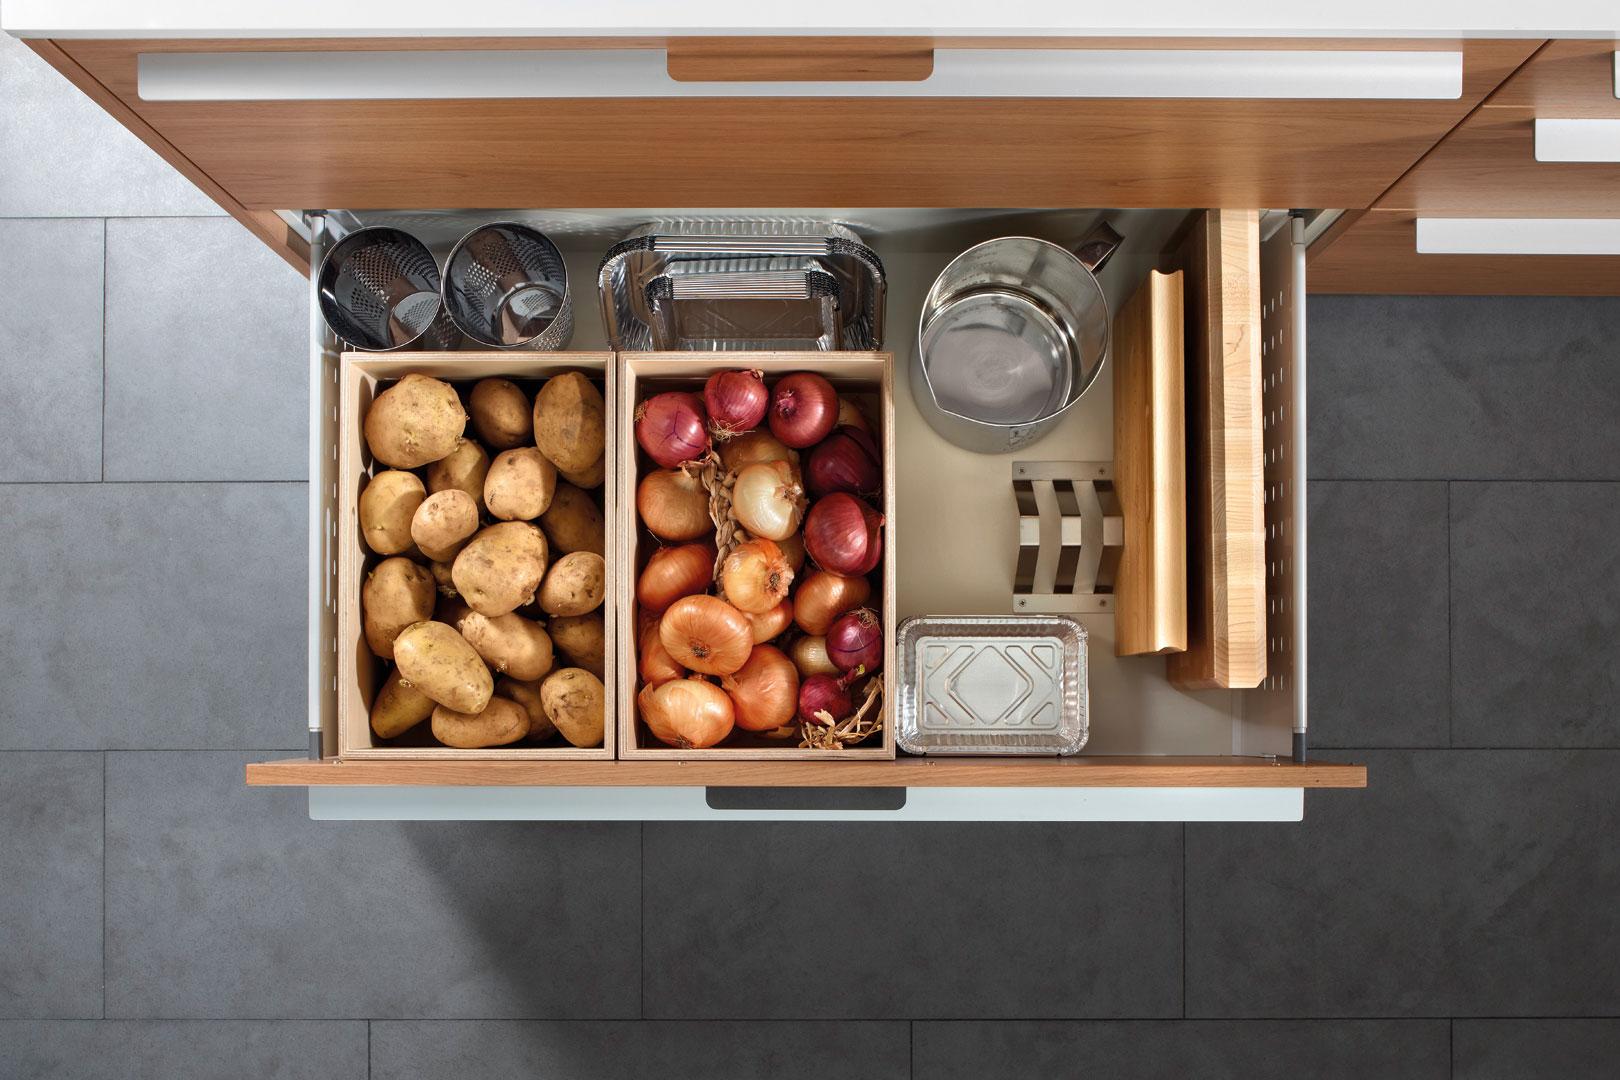 Accesorios De Cocina Santos Orden Y Belleza Santiago Interiores ~ Accesorios Interior Armarios Cocina